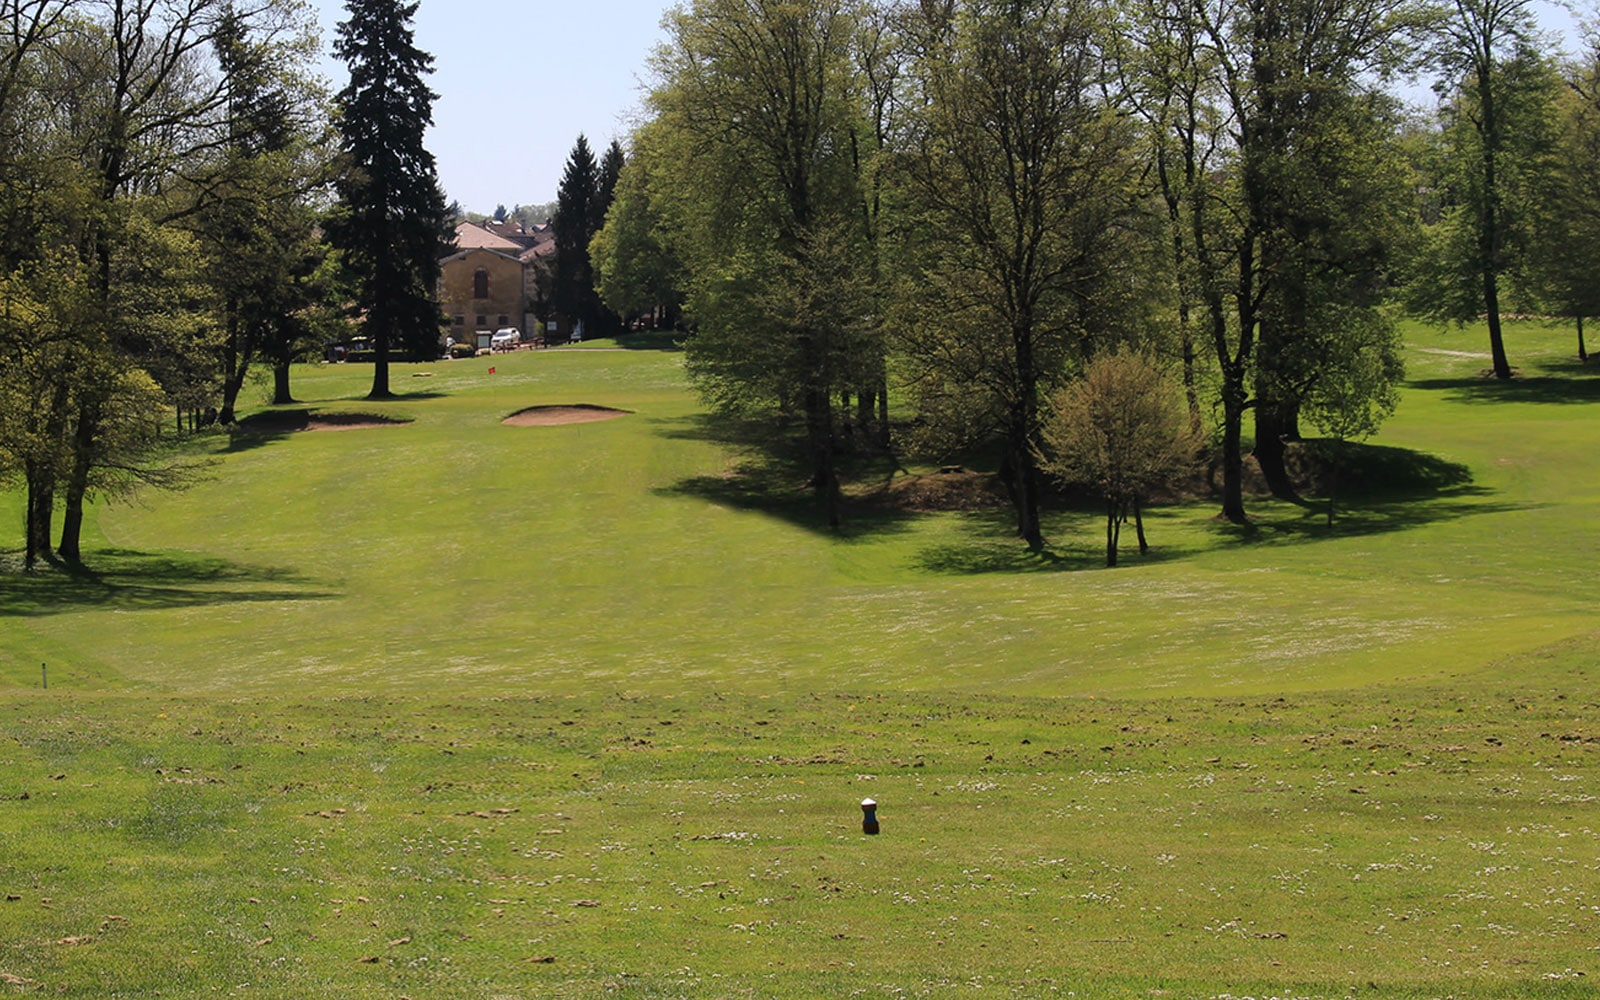 Golf Club d'Avrainville